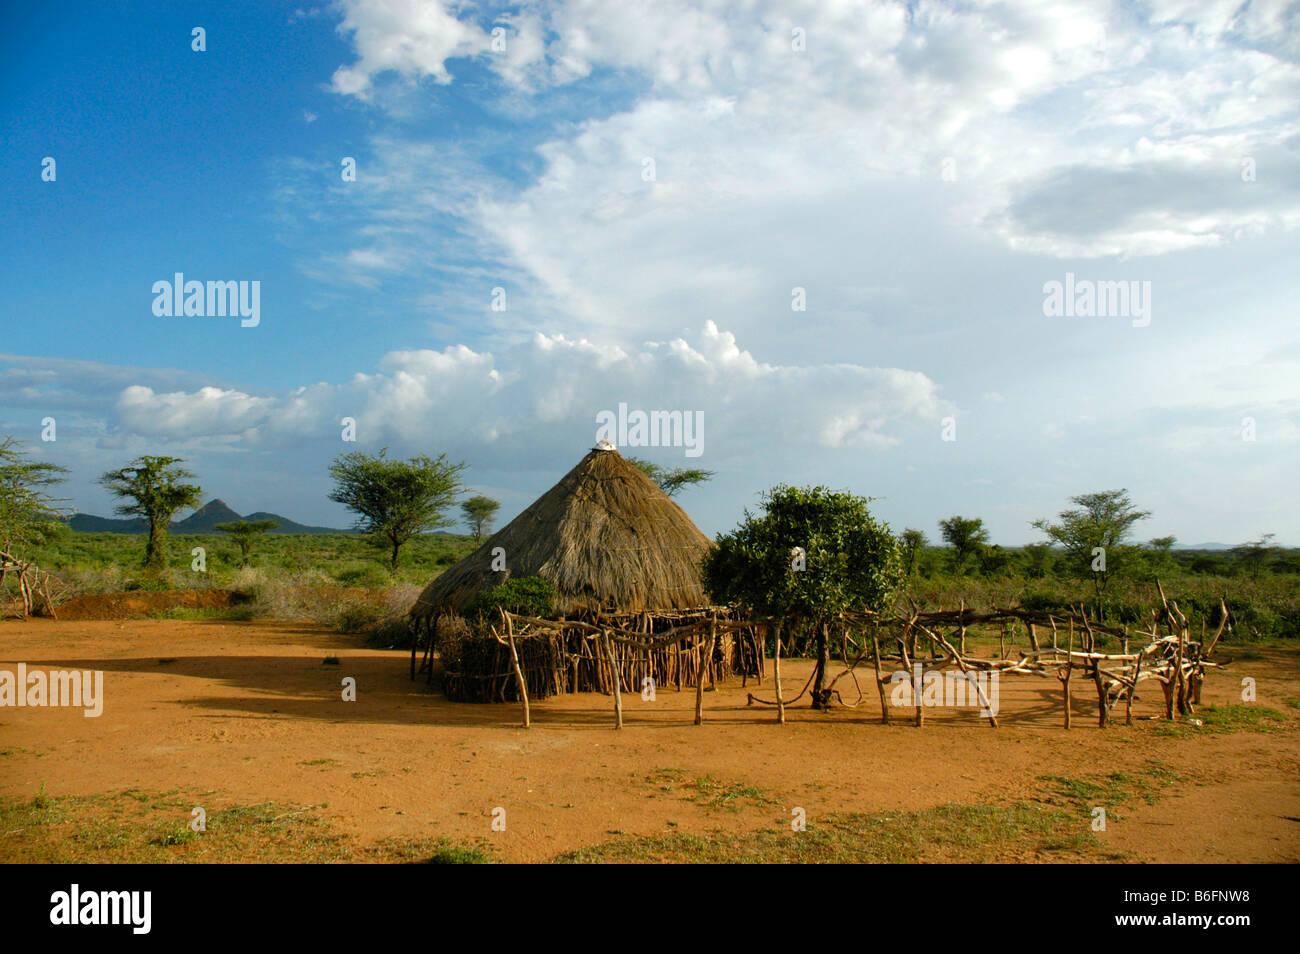 Simple hut in the bush savanna, Turmi, Ethiopia, Africa - Stock Image